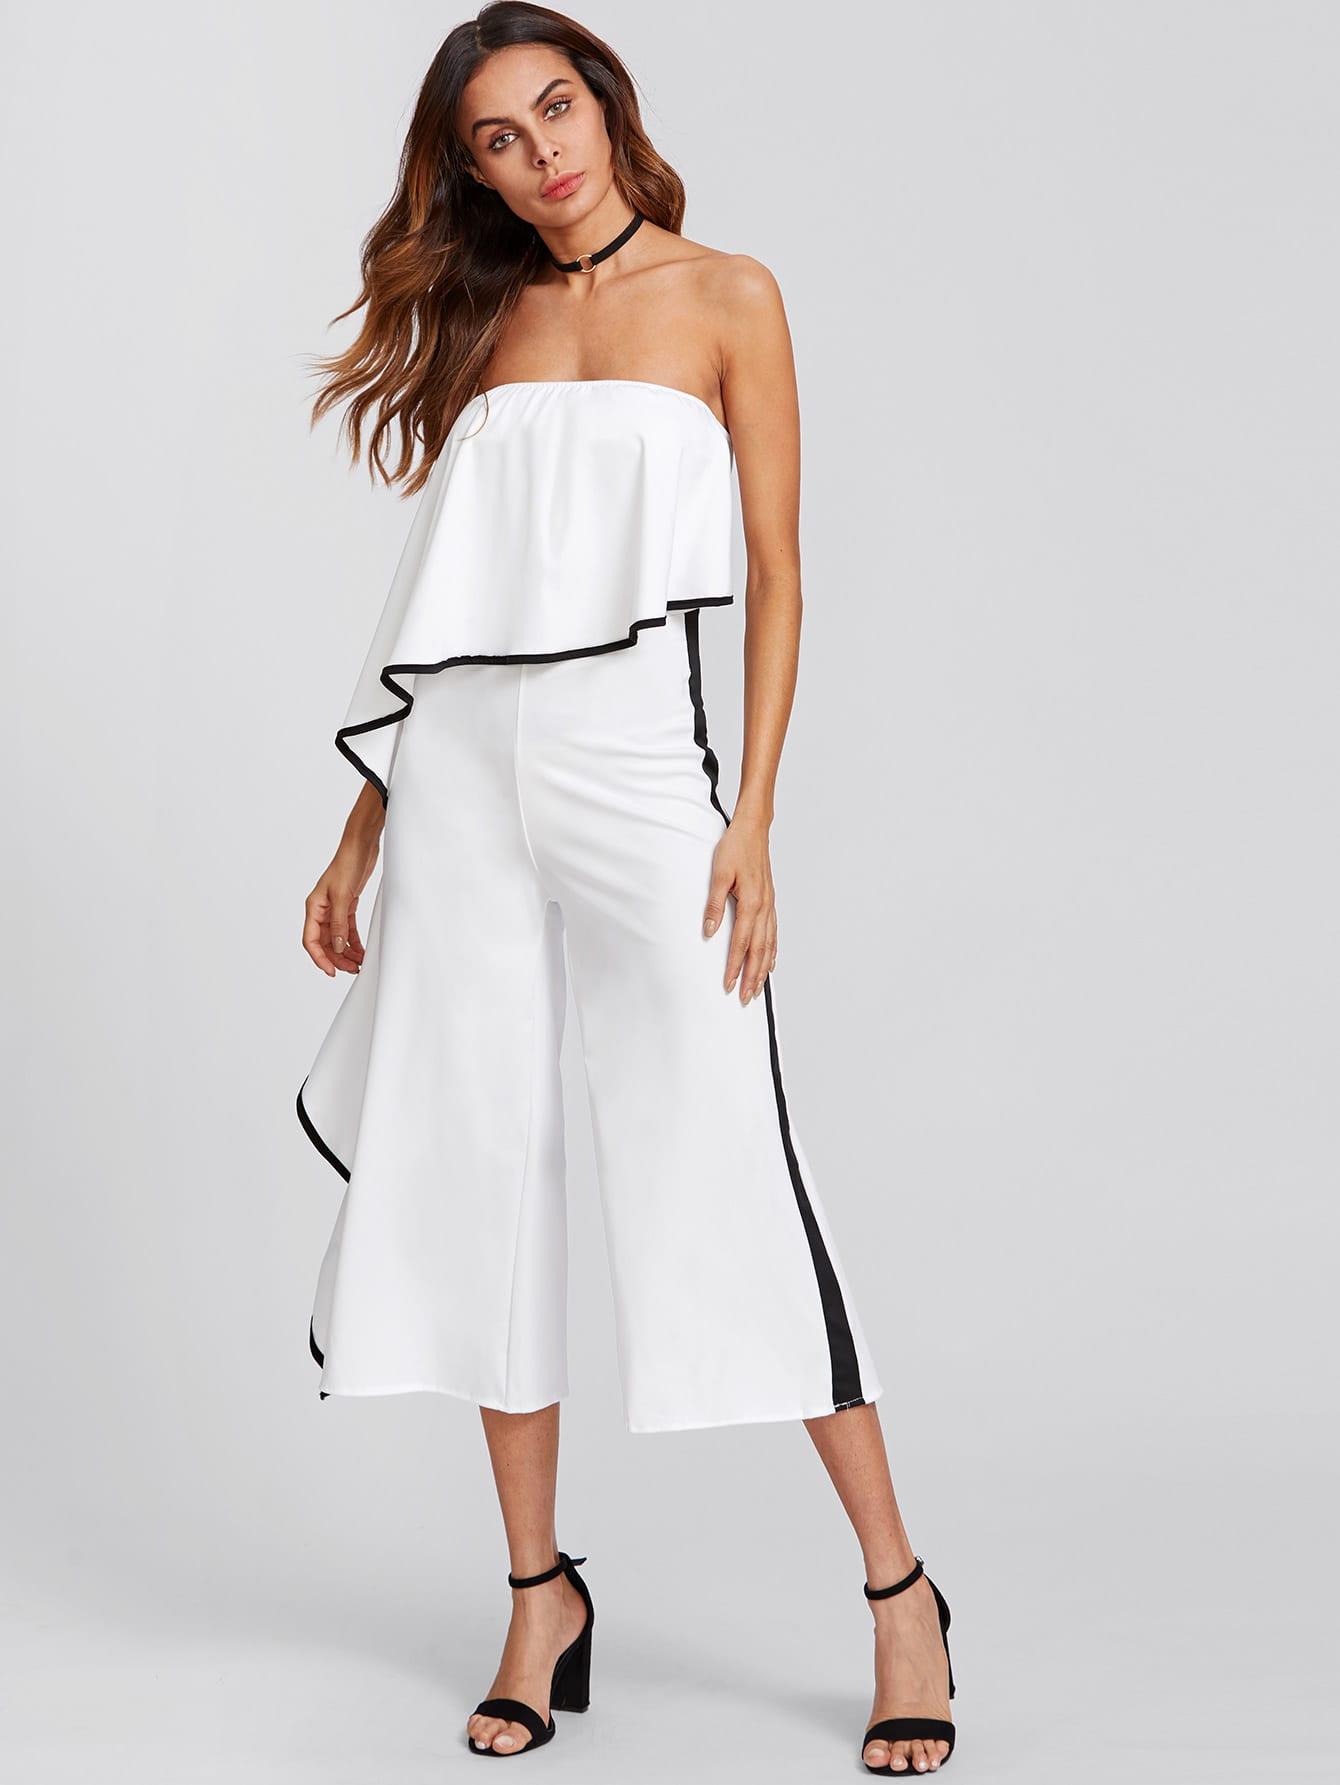 Contrast Trim Frill Strapless Jumpsuit black one shoulder frill layered design jumpsuit